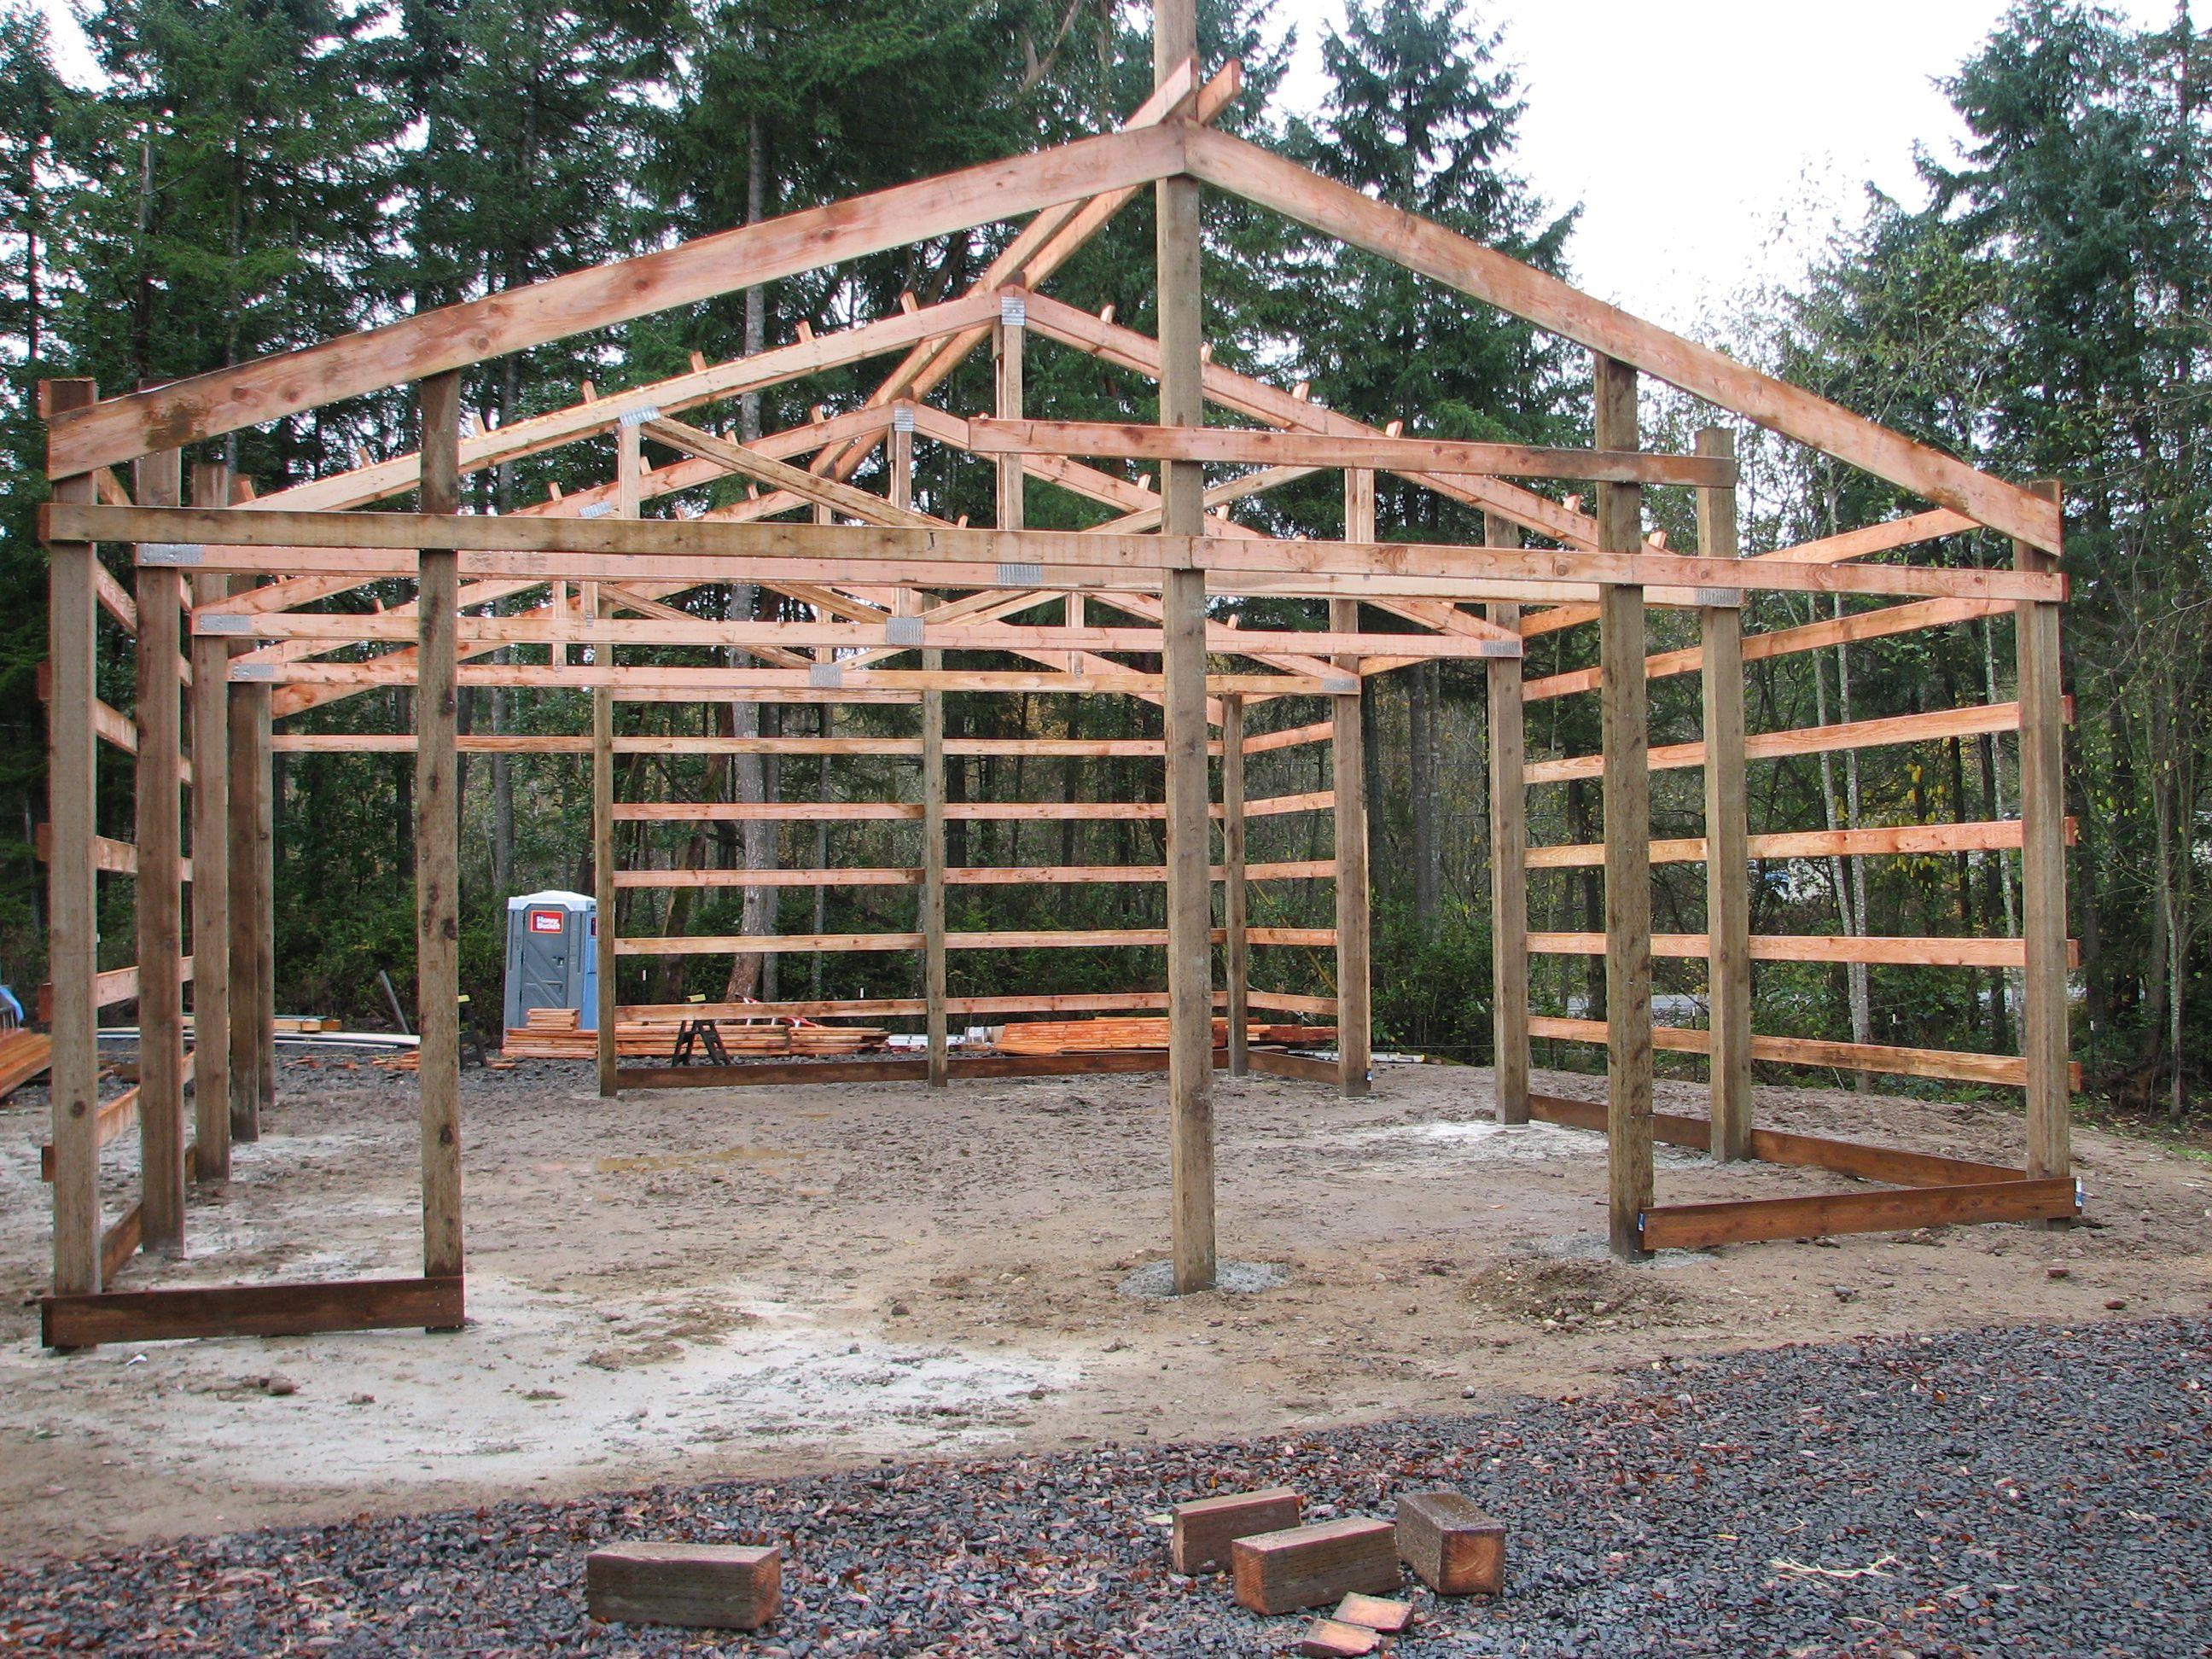 Layout Barn construction, Pole barn plans